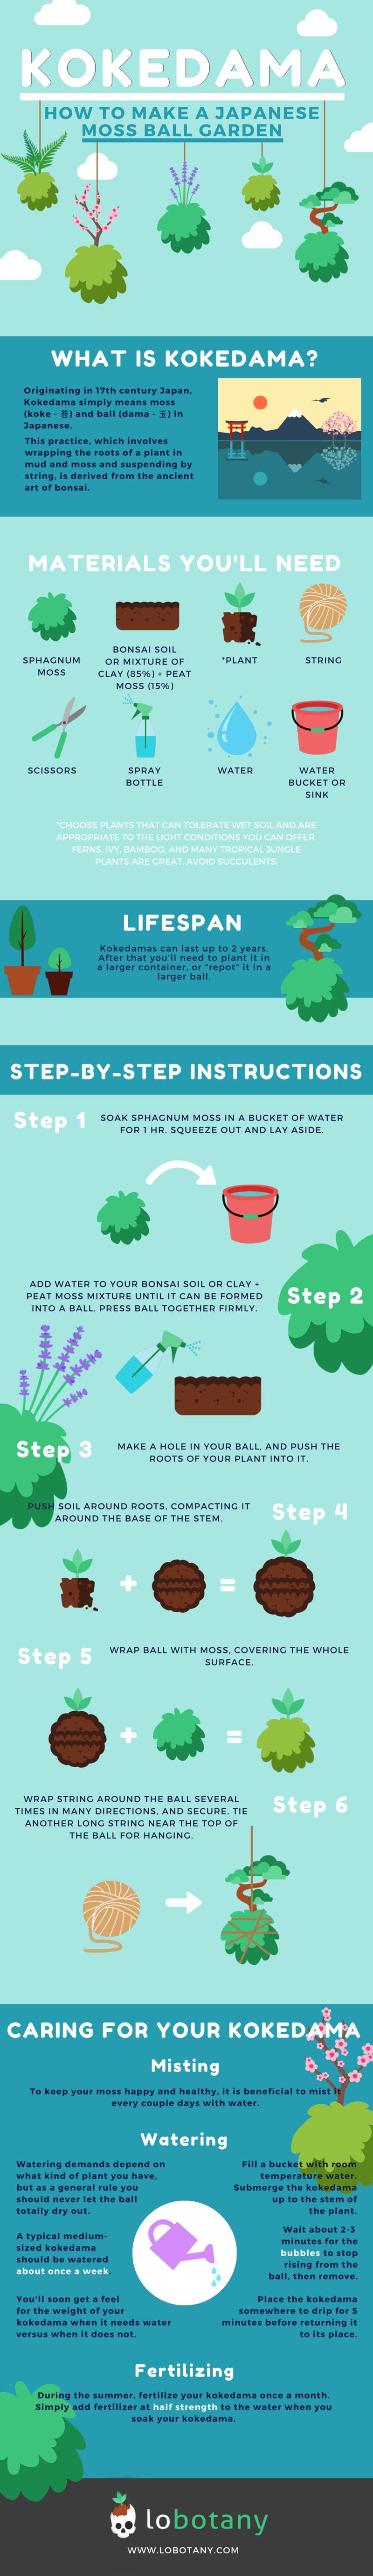 DIY kokedama infographic how to make Japanese moss ball garden